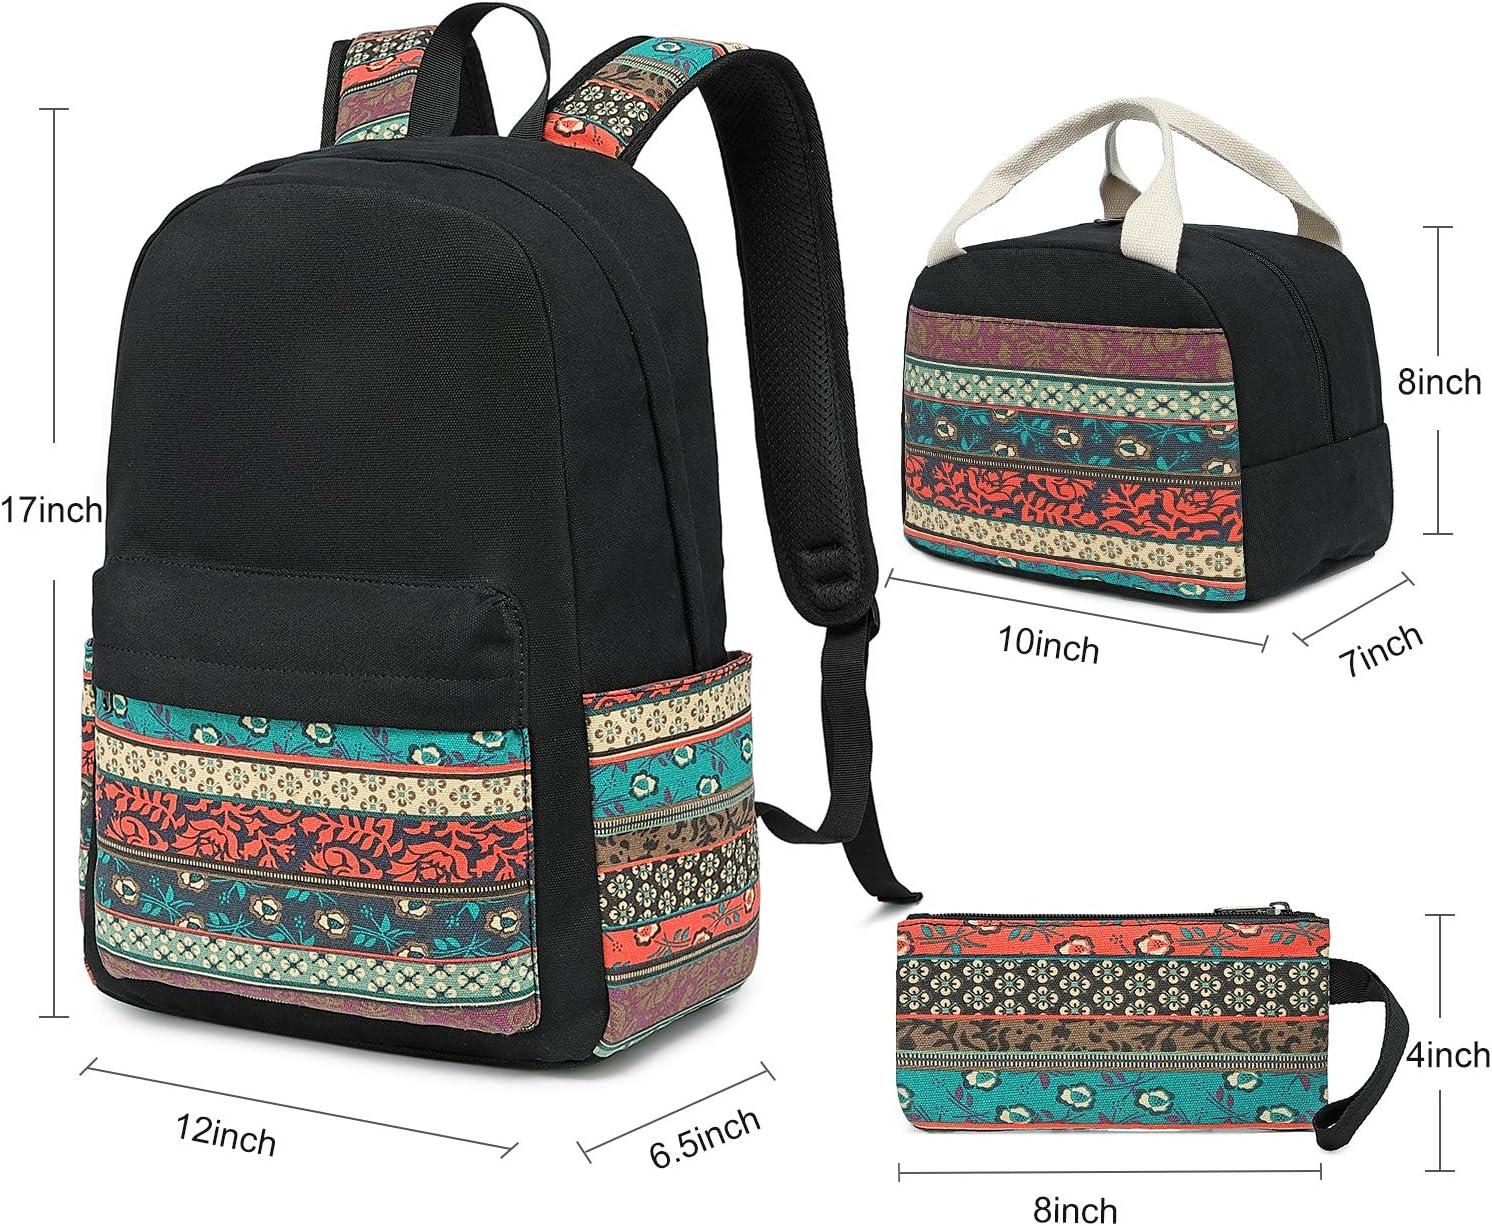 NGIL Themed Prints Canvas Carry on Shoulder 23 Dufle Bag